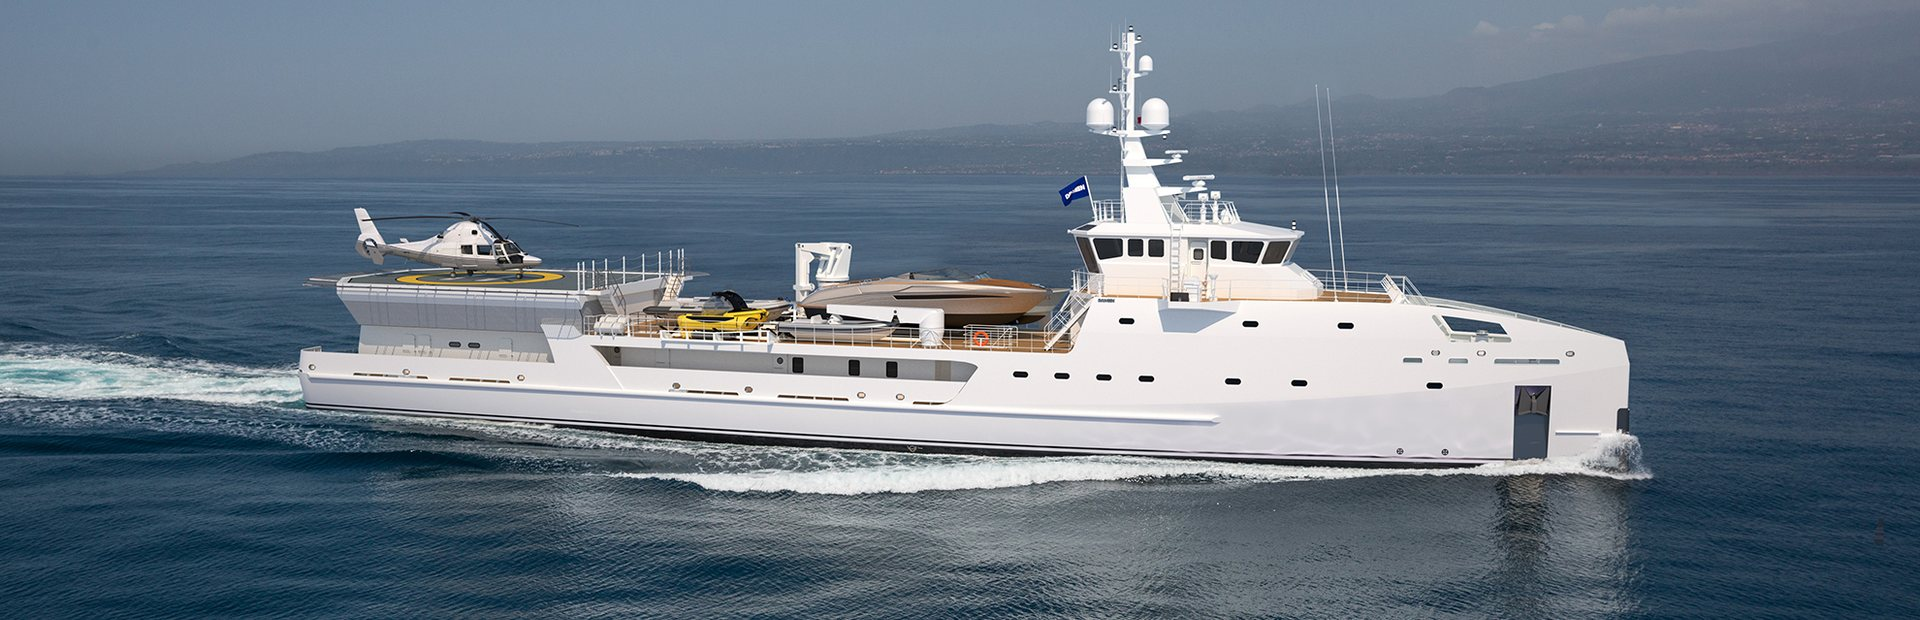 Damen YS 6911 Yacht Charter